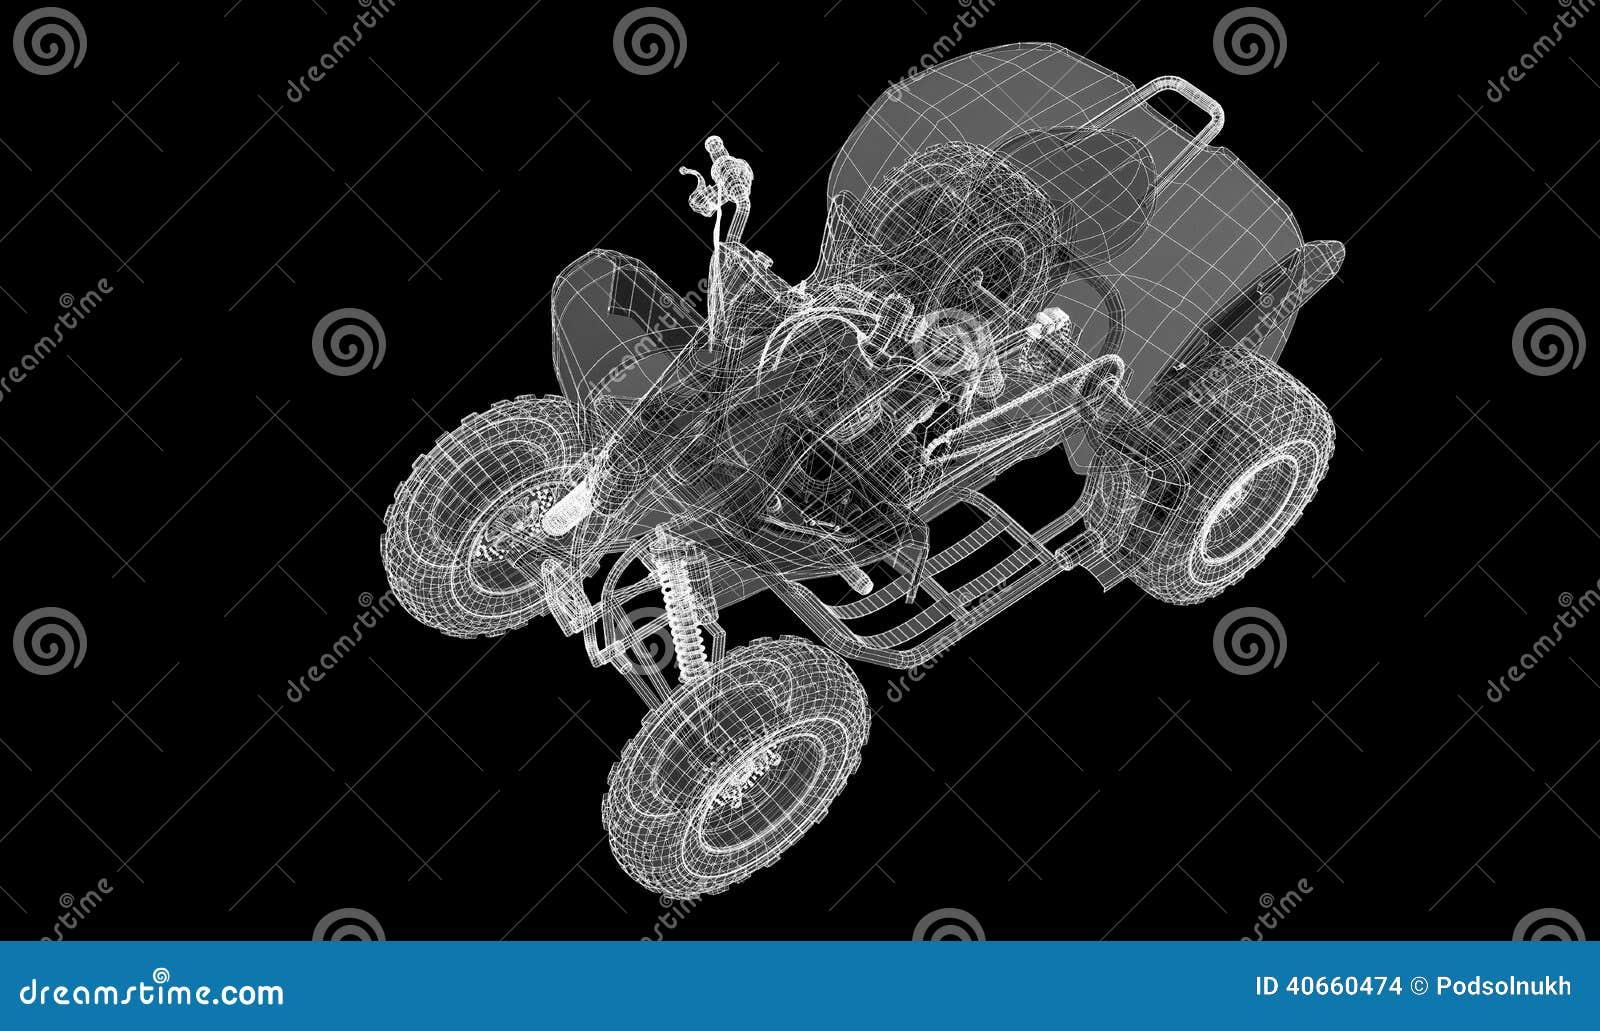 Quad Bike, Motorcycle, 3D Model Stock Illustration - Illustration of ...